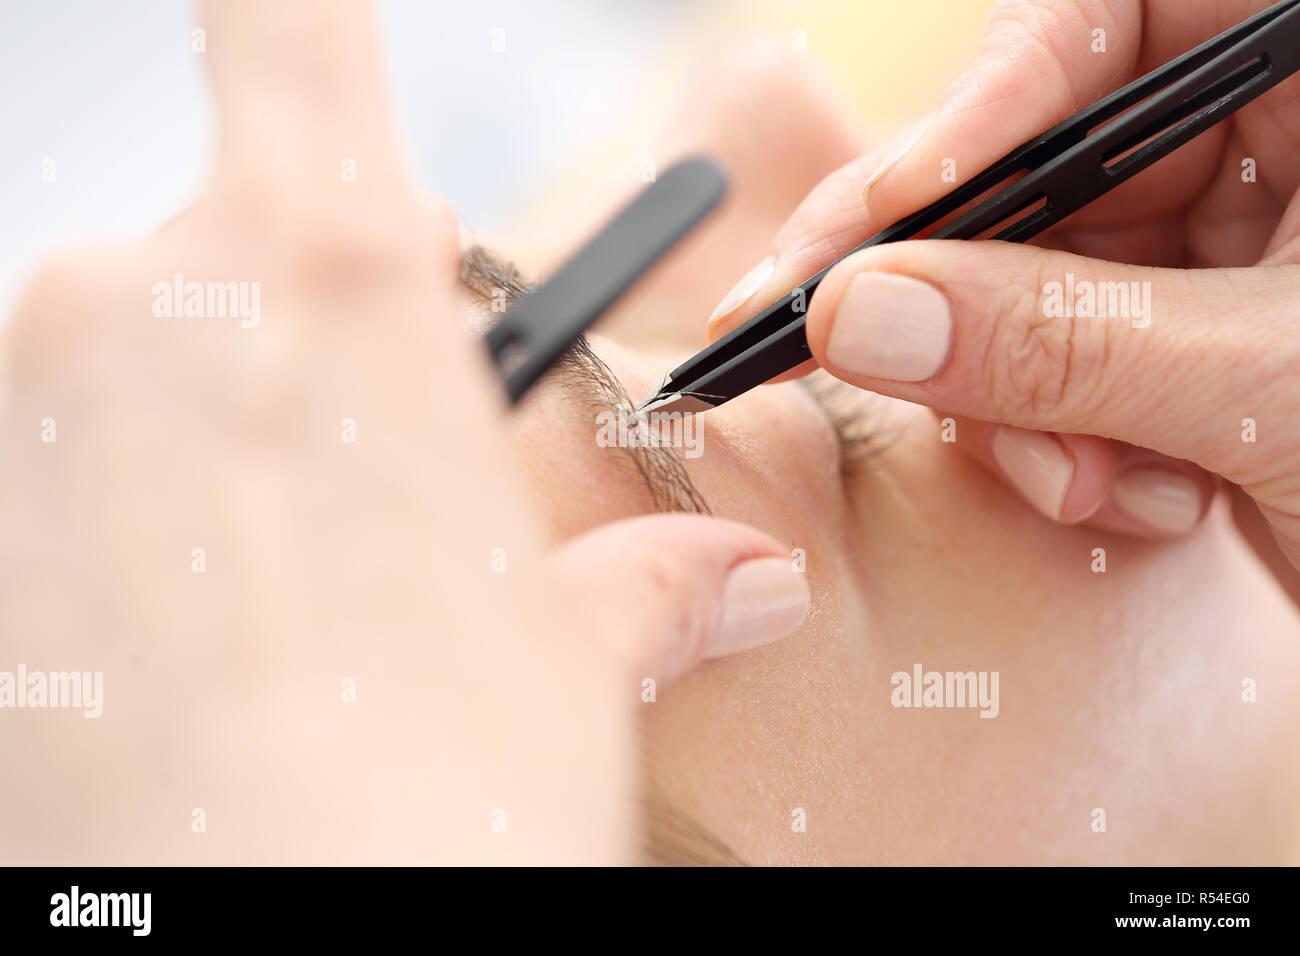 eyebrow tweezers. hair removal. adjusting the eyebrows in the beauty salon. henna and eyebrow adjustment. eyebrow styling - Stock Image